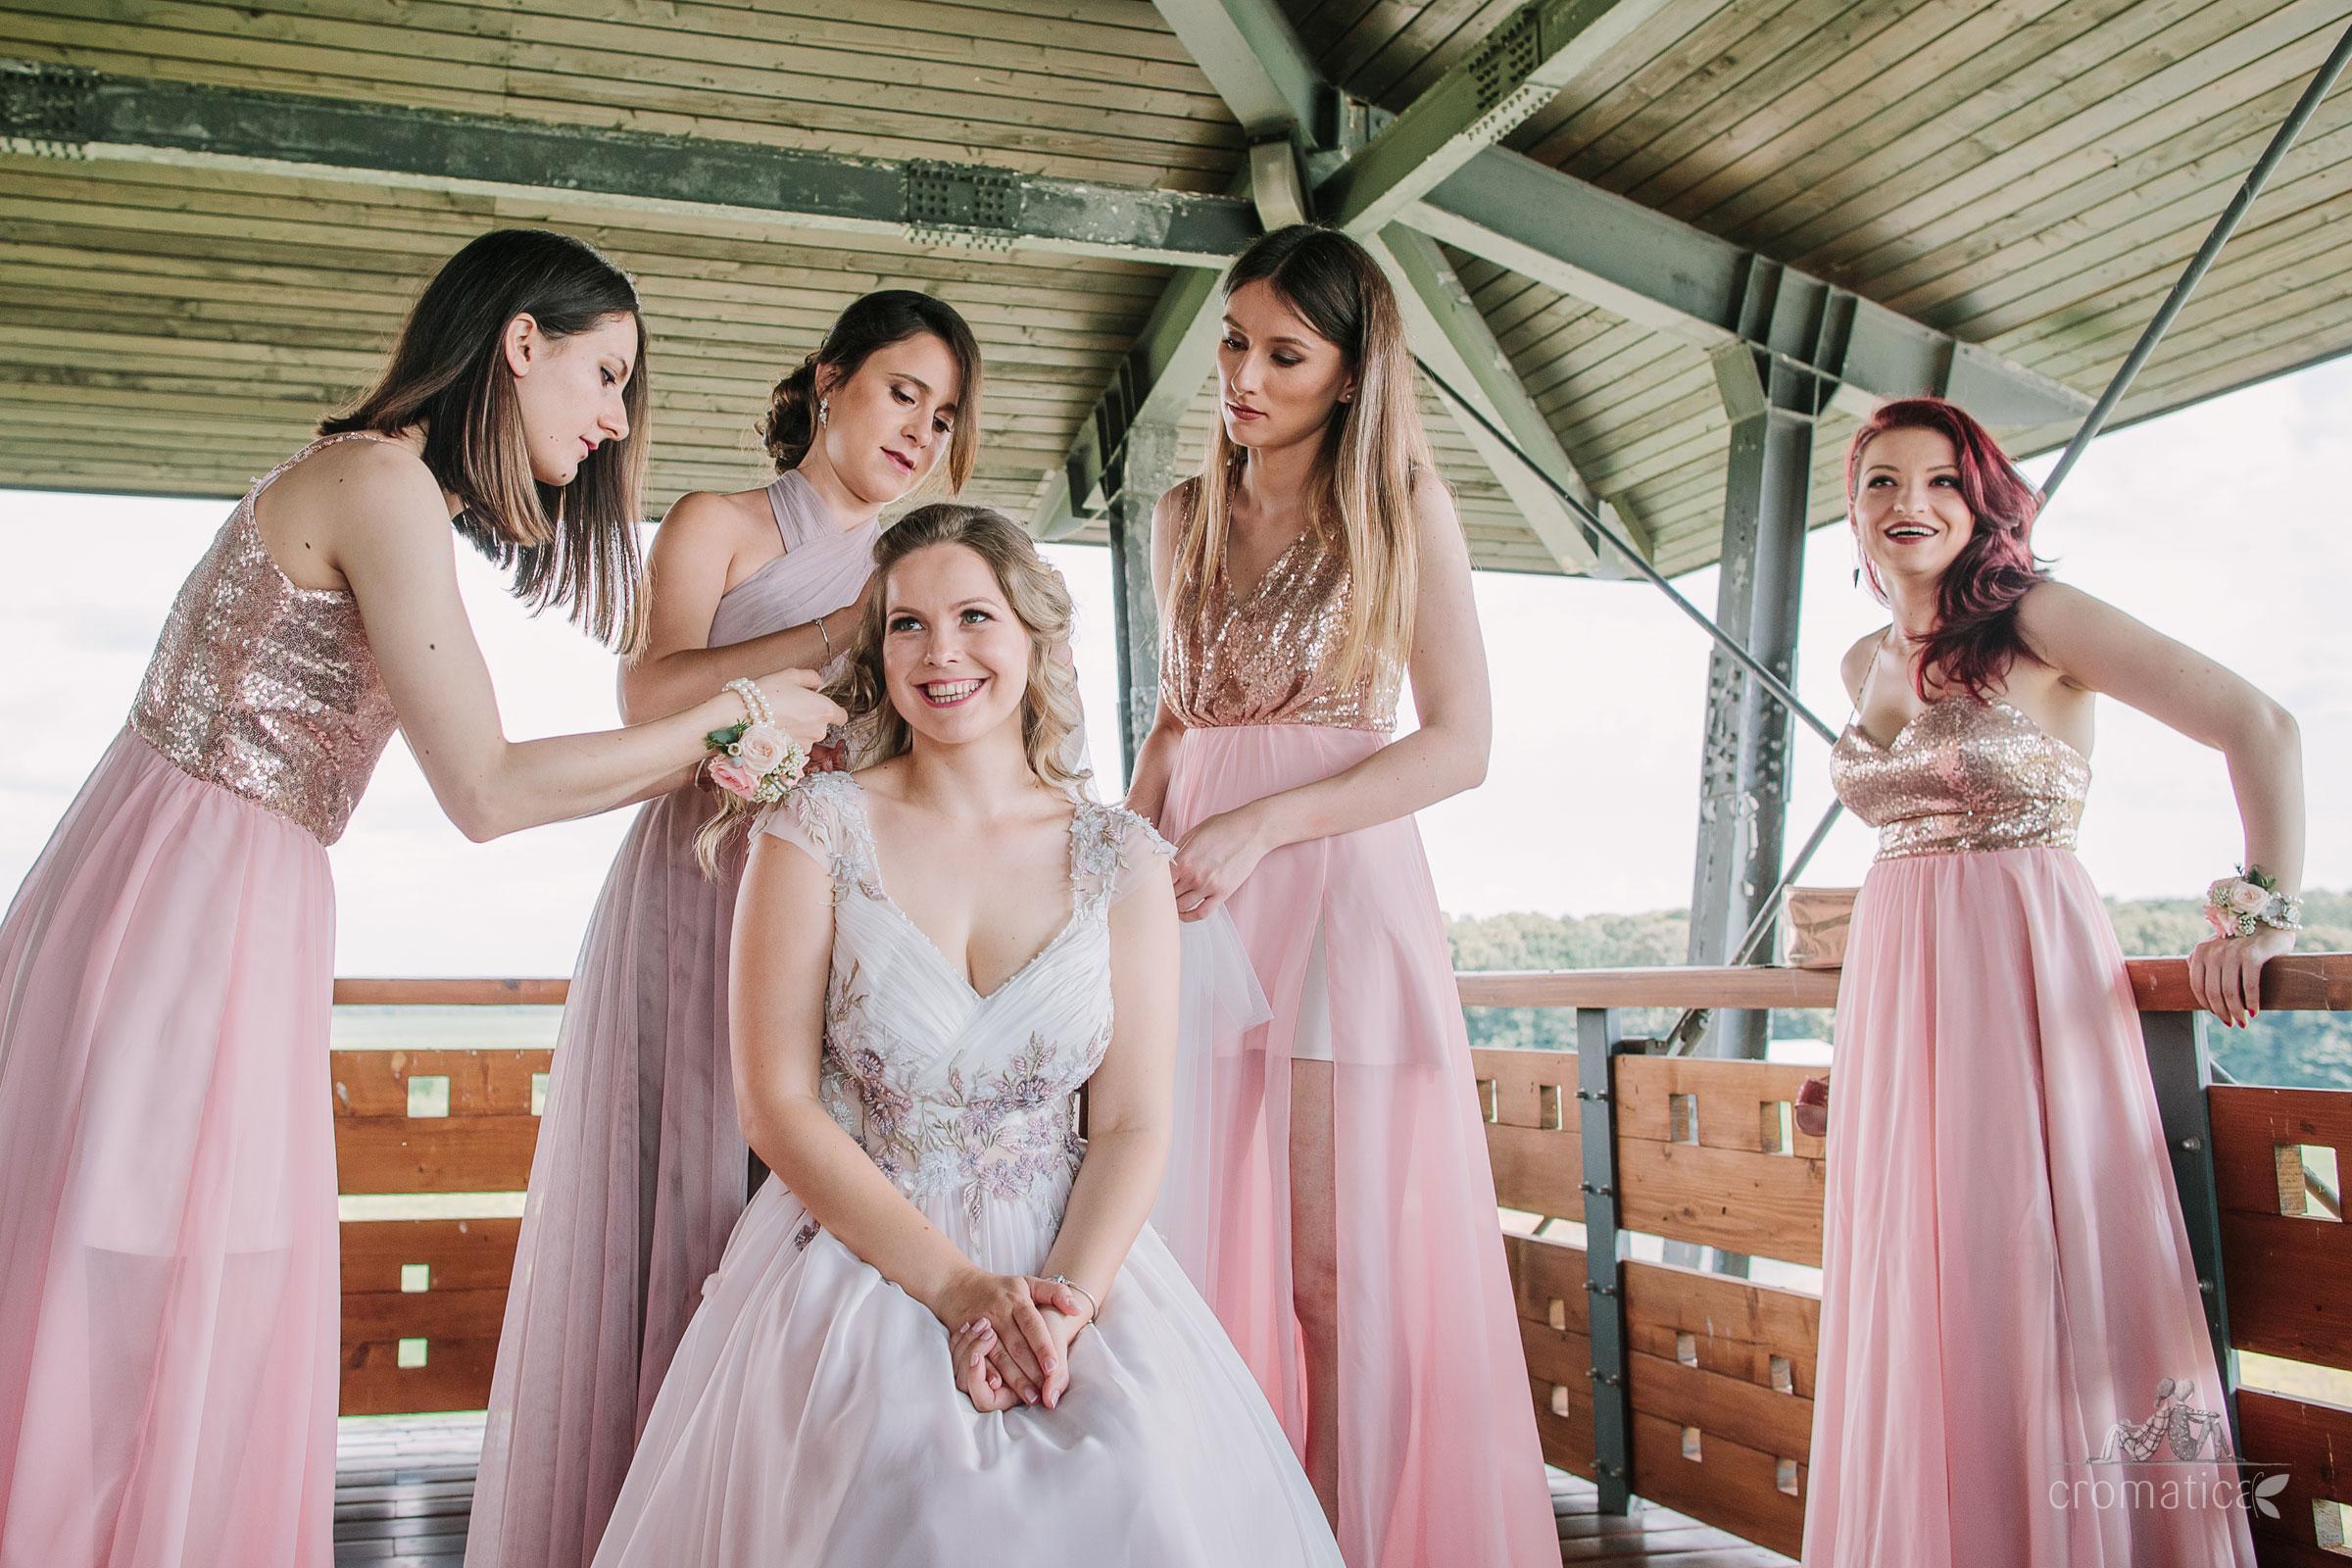 alexandra george fotografii nunta casa vlasia 025